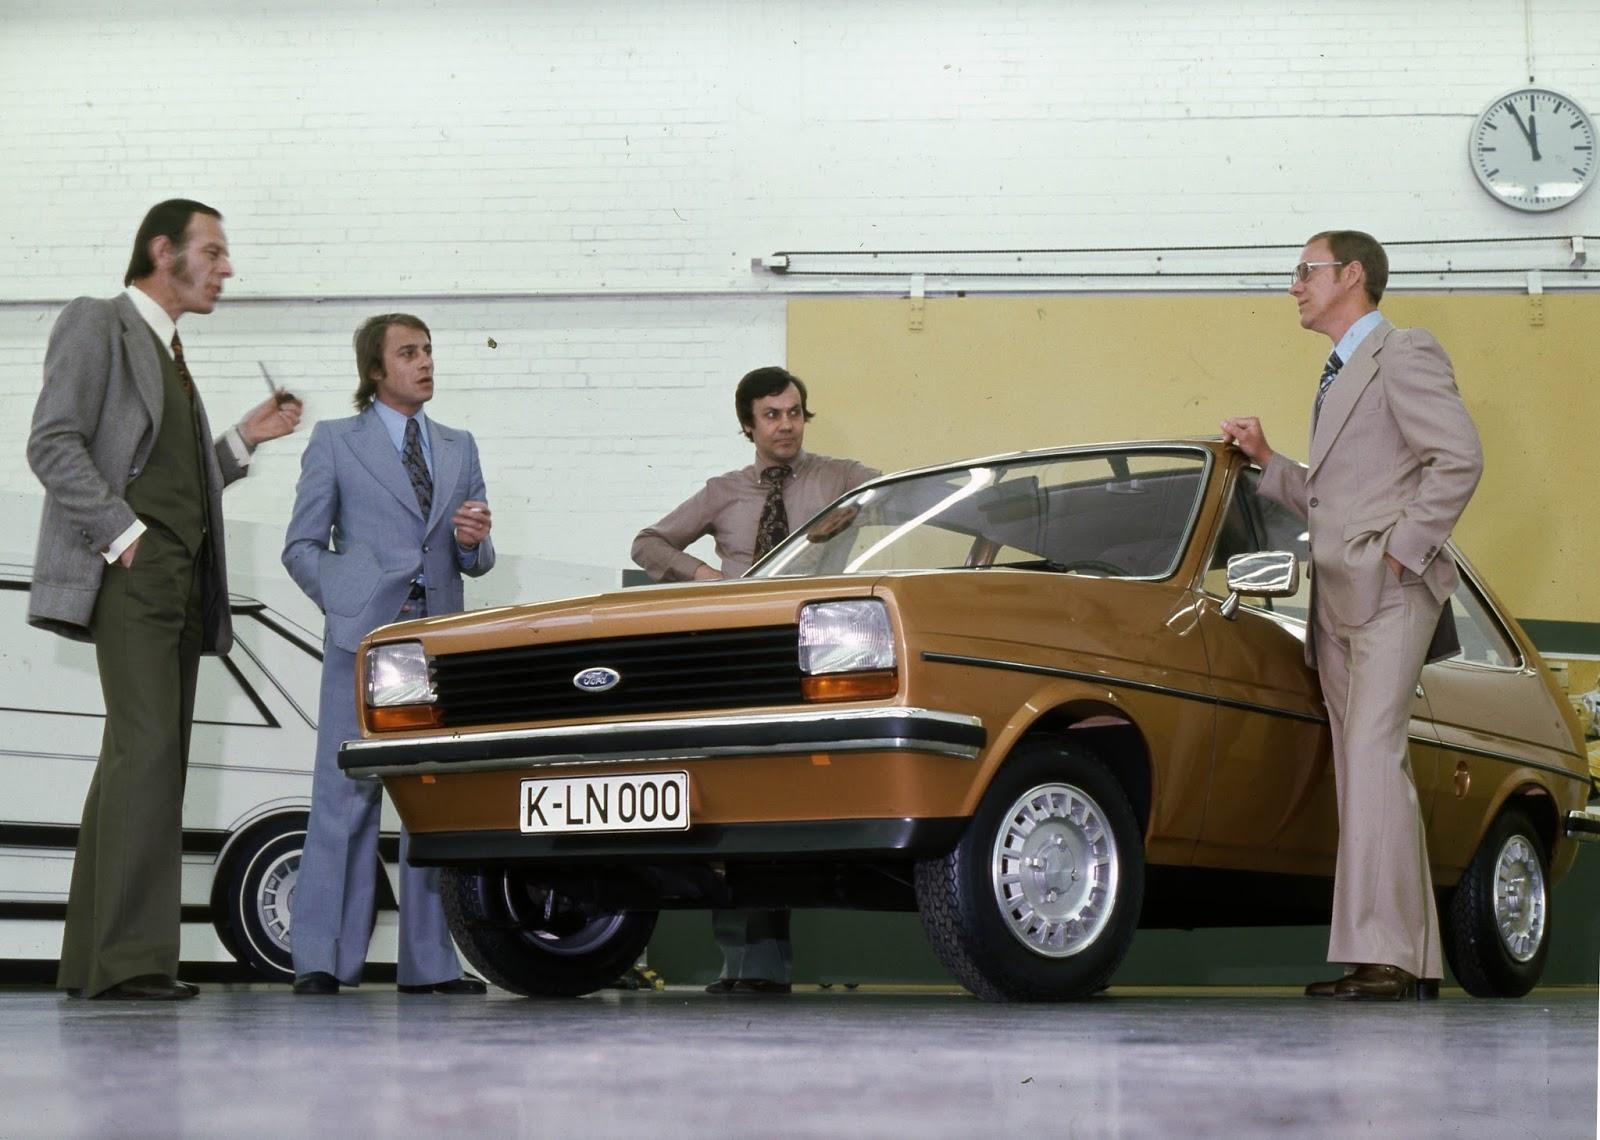 FordFiesta 1976 1983 DesignStudio UweBahnsen ClaudeLobo Merkenich 1976 01 2 Έκανες Πολύ Δρόμο Μωρό μου! - Το Ford Fiesta Γίνεται 40 Ετών Ford, Ford Fiesta, Fun, videos, zblog